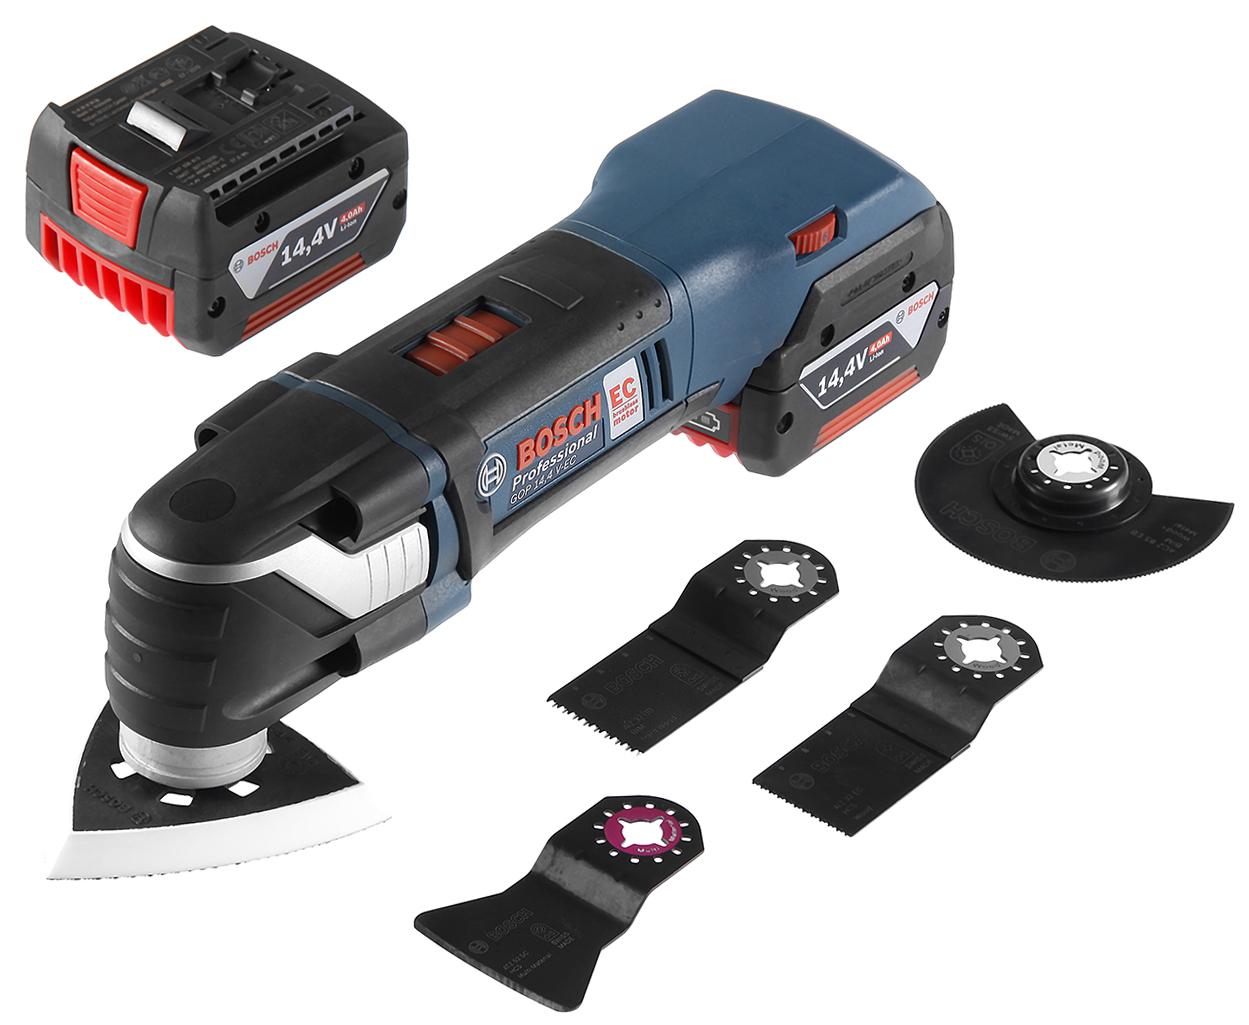 Аккумуляторный реноватор Bosch Gop 14,4 v-ec l-boxx